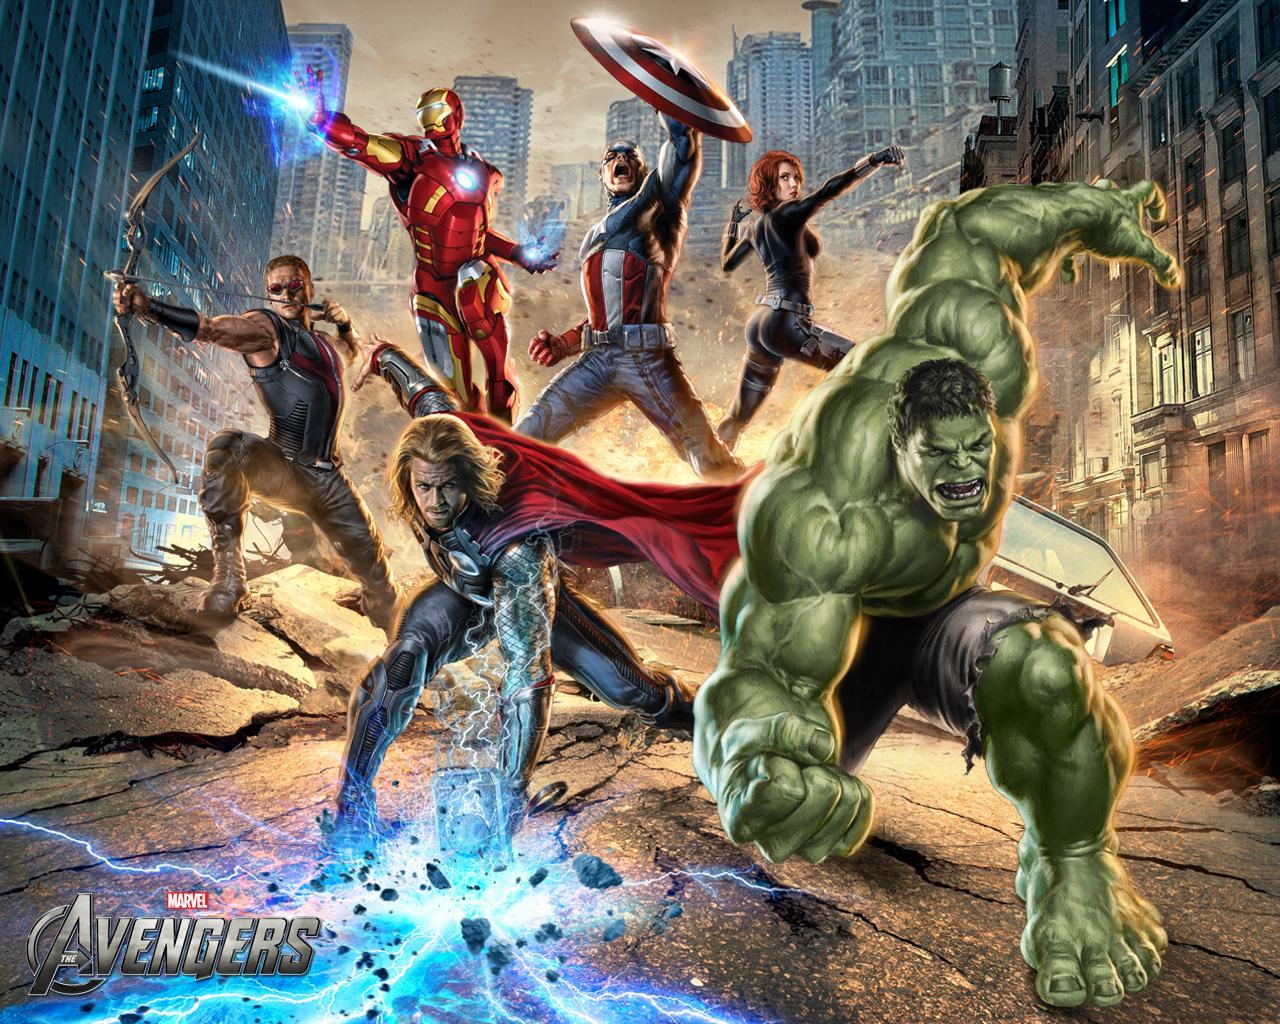 The Avengers movie art - Flickr - Photo Sharing!